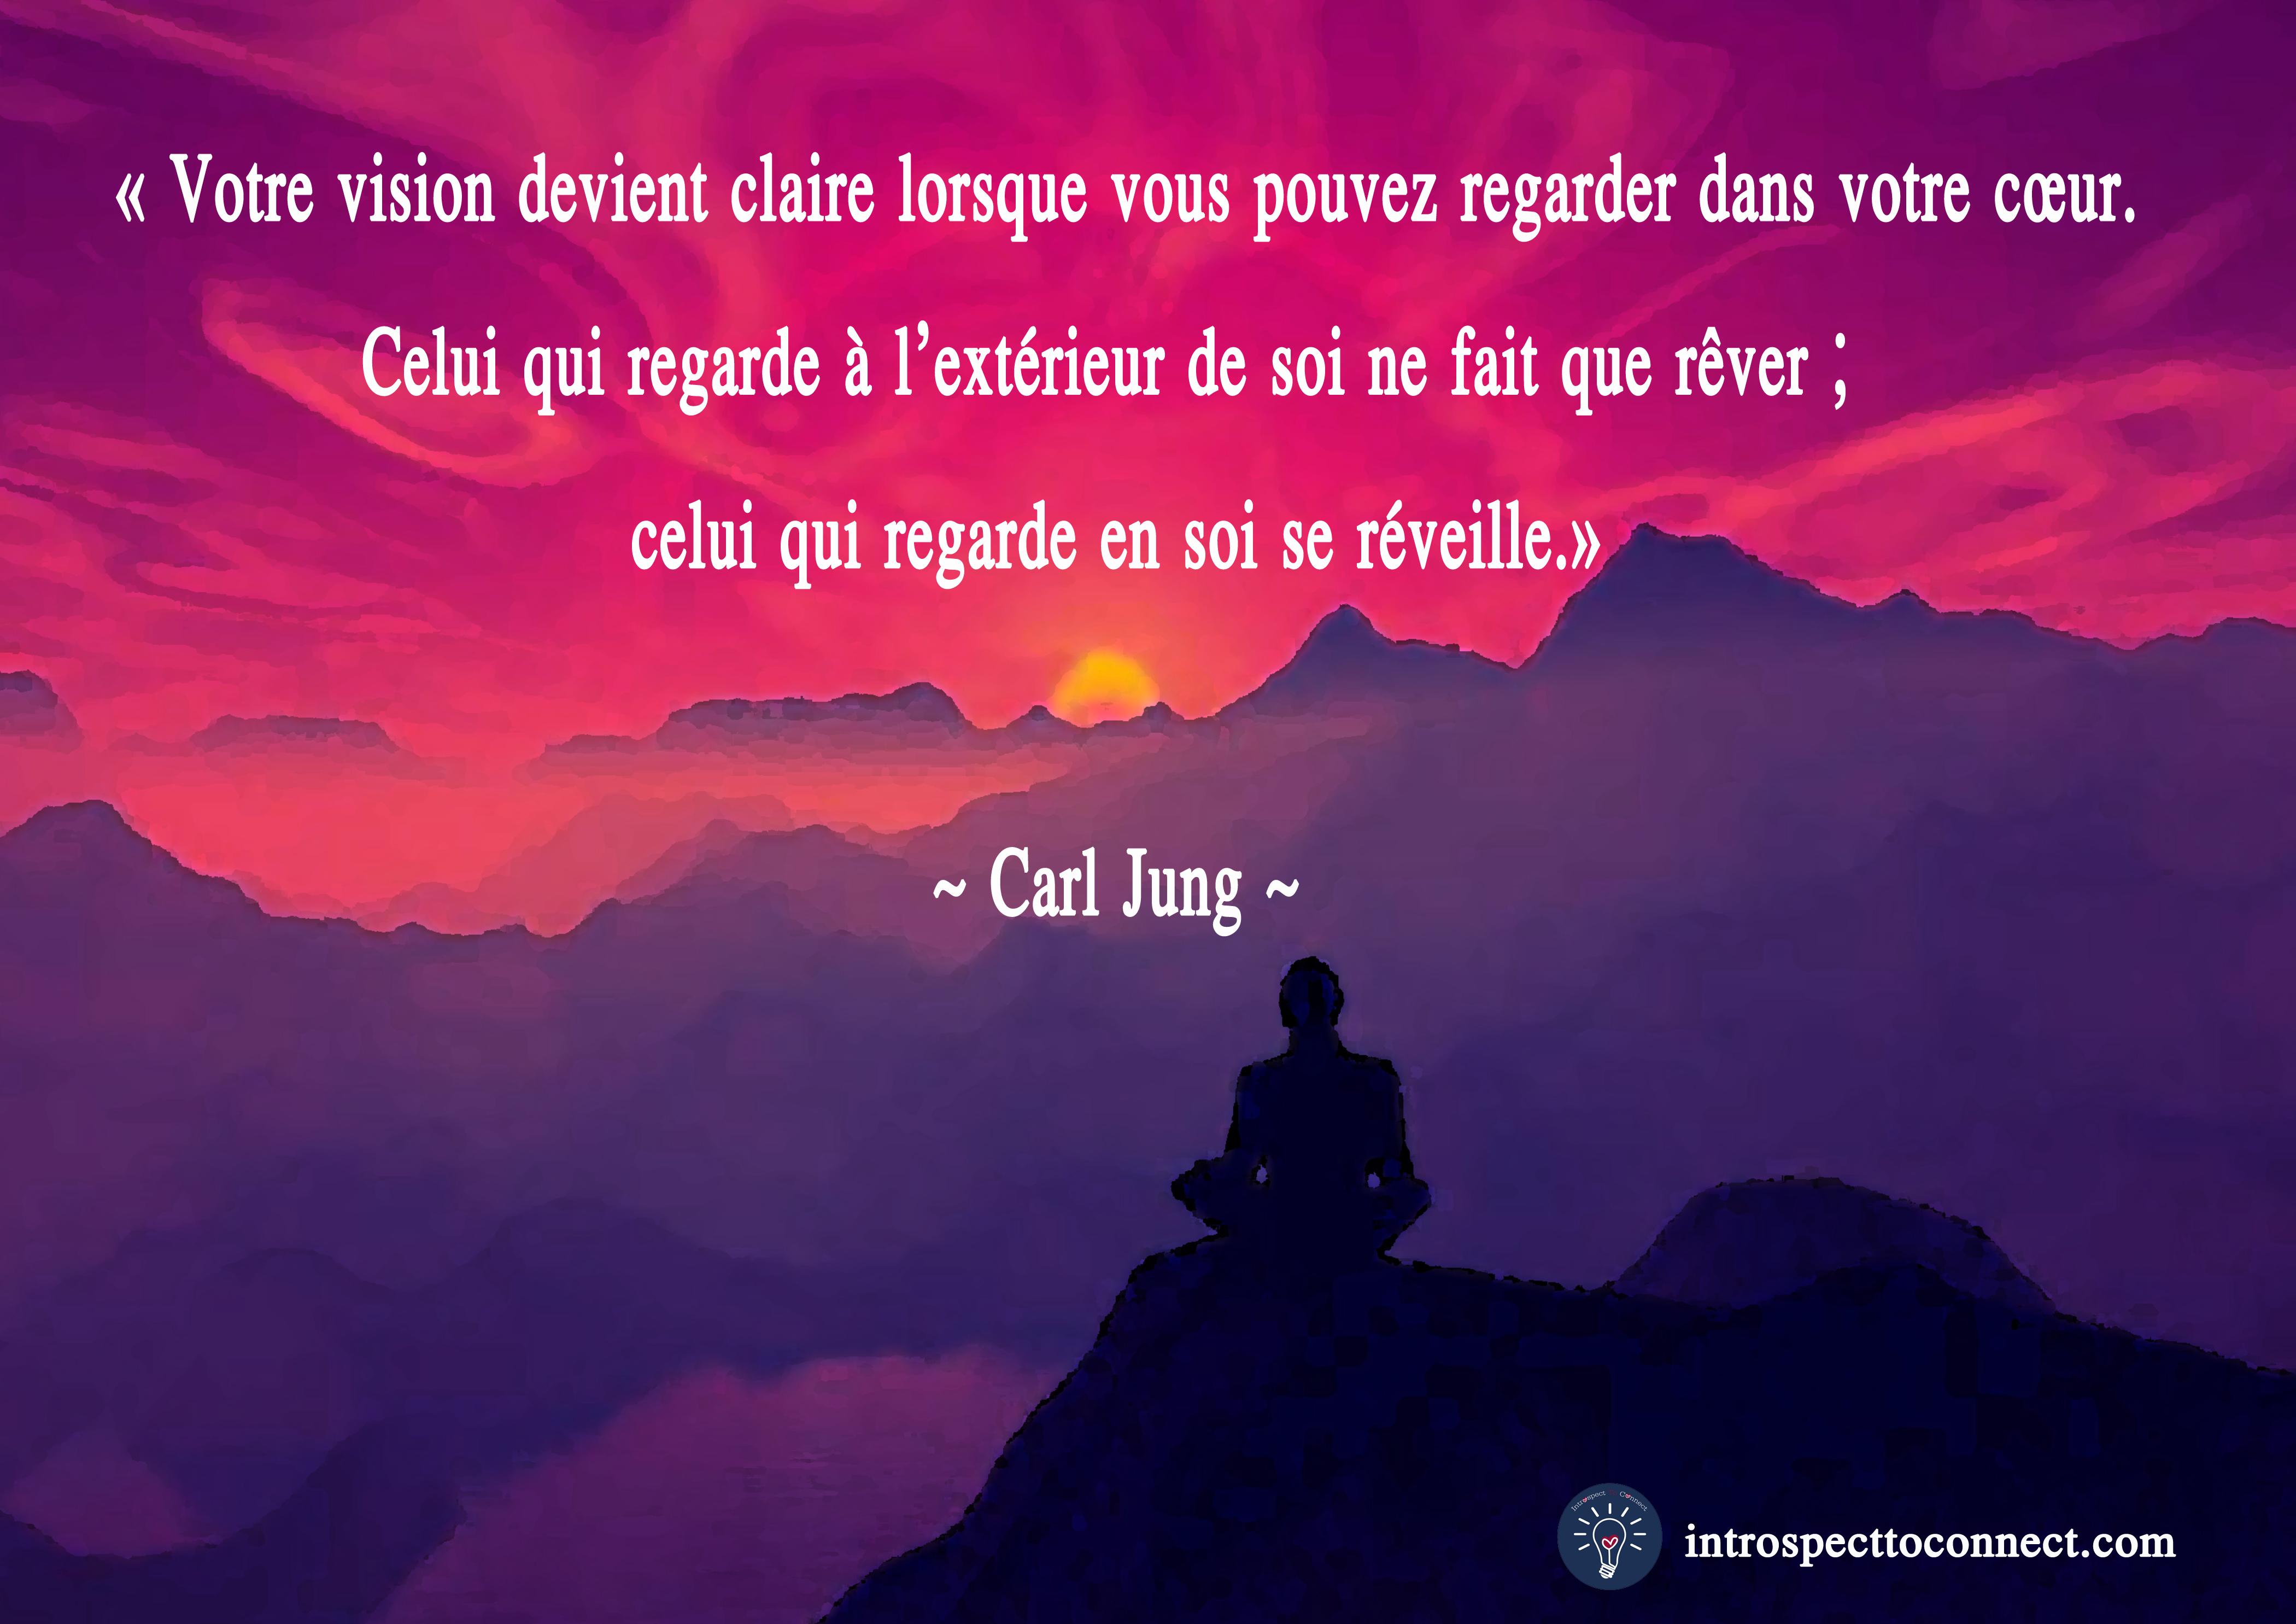 carl jung citation 3 copie